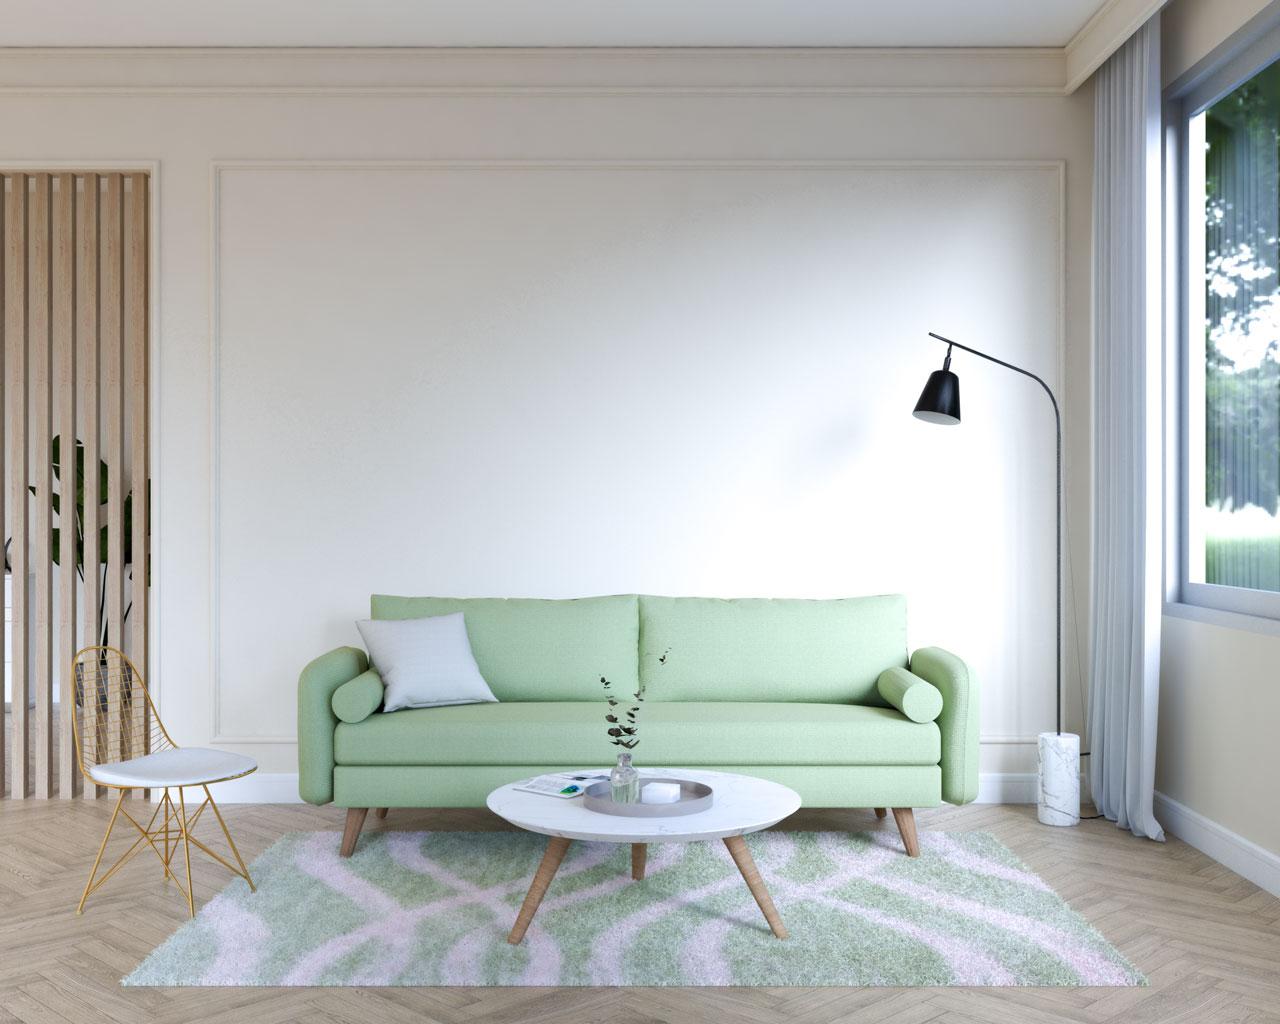 Light olive sofa in beige living room